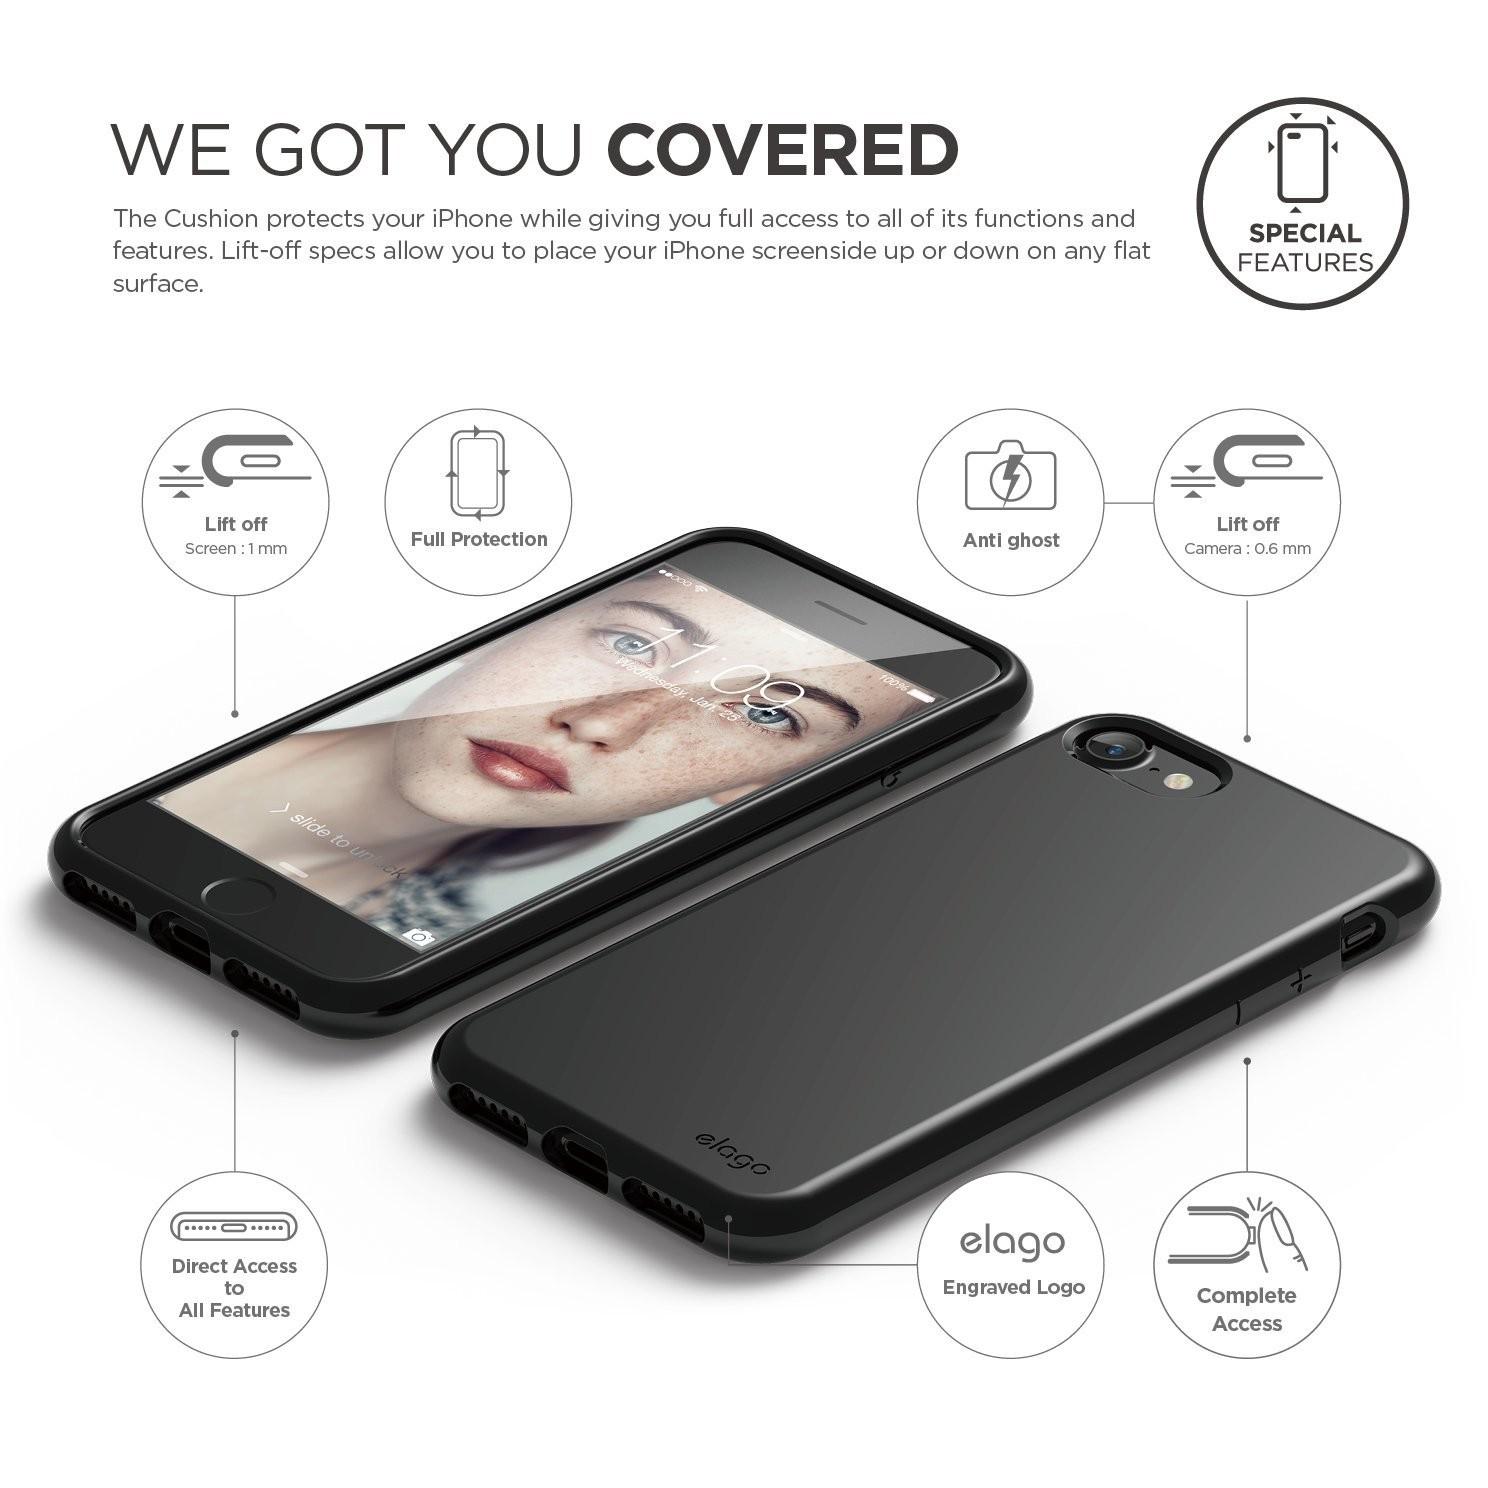 elago   Cushion for iPhone 7 - Jet Black - Cases 70be3fc40ed